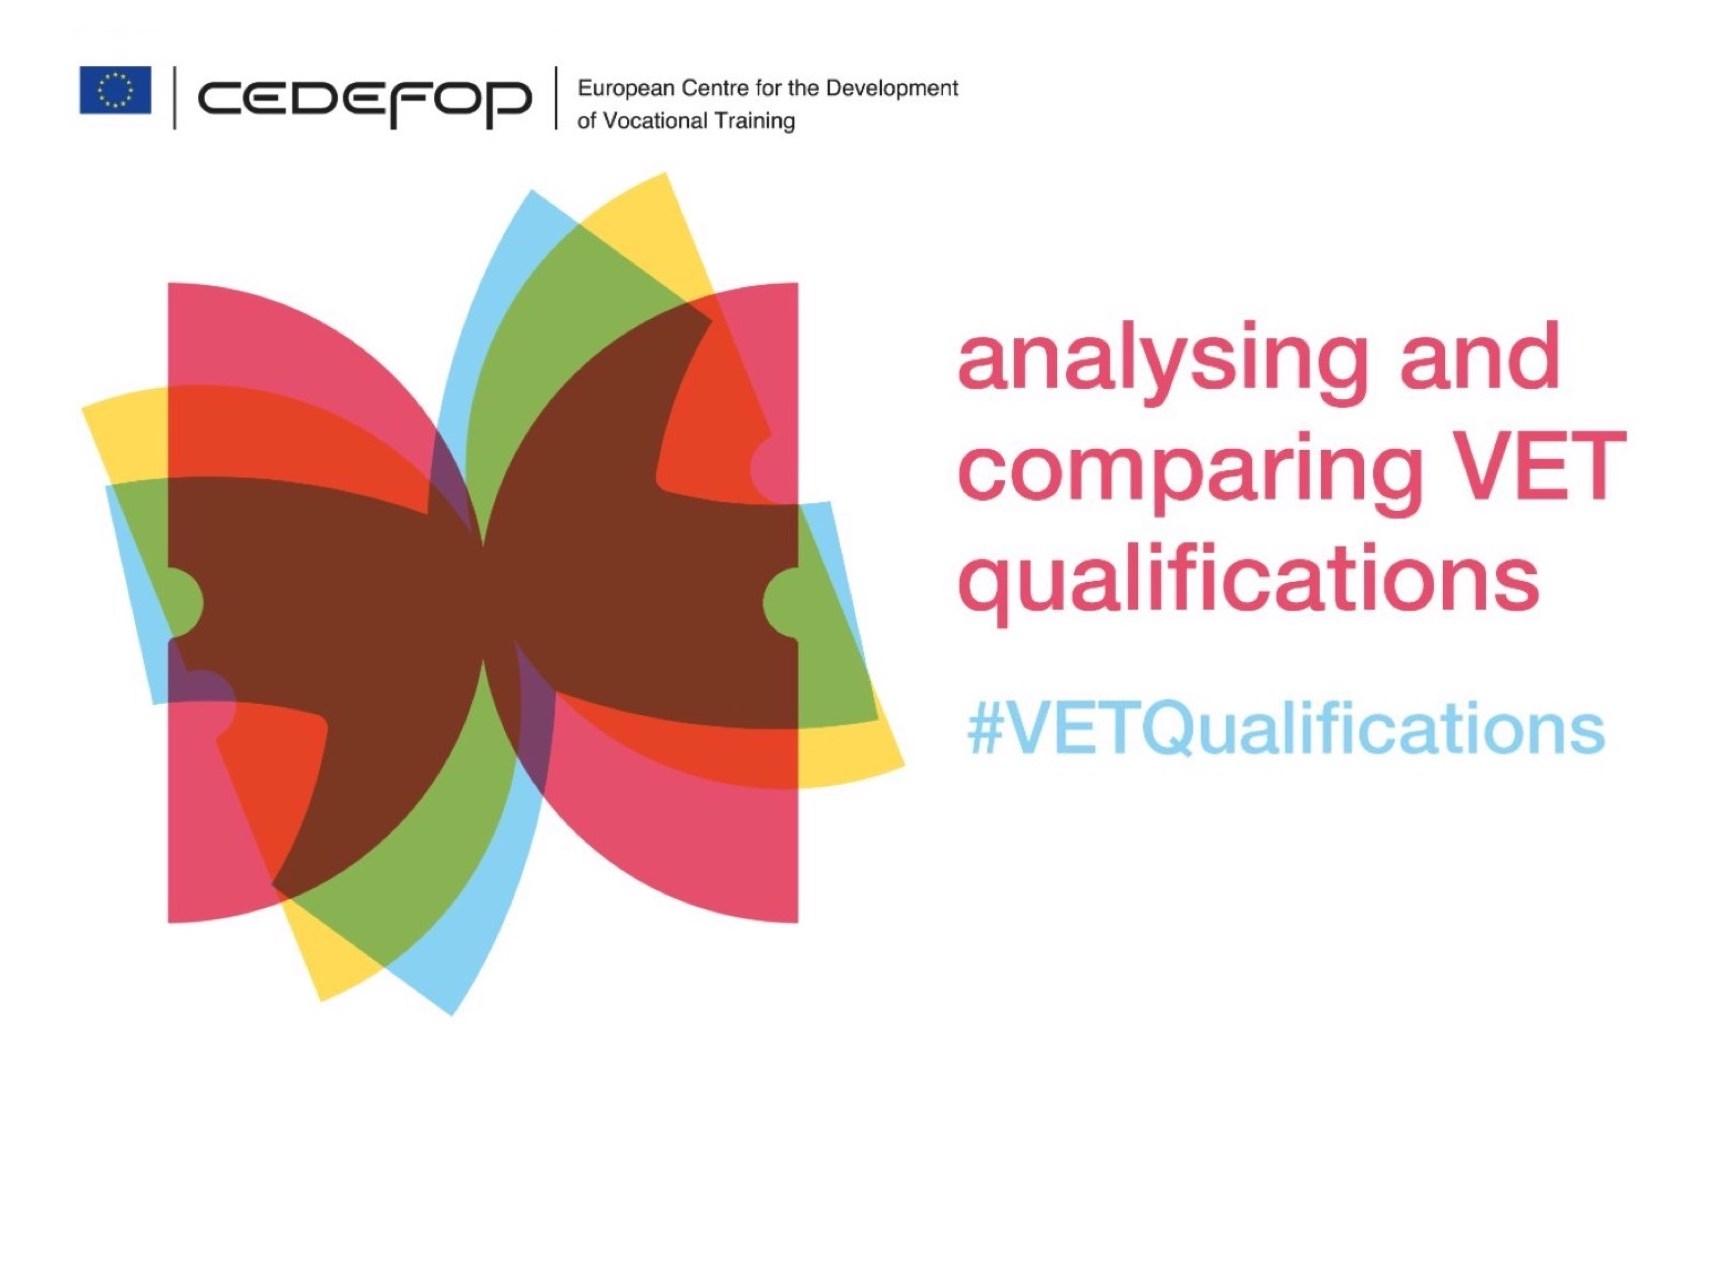 Cedefop's VET qualifications workshop